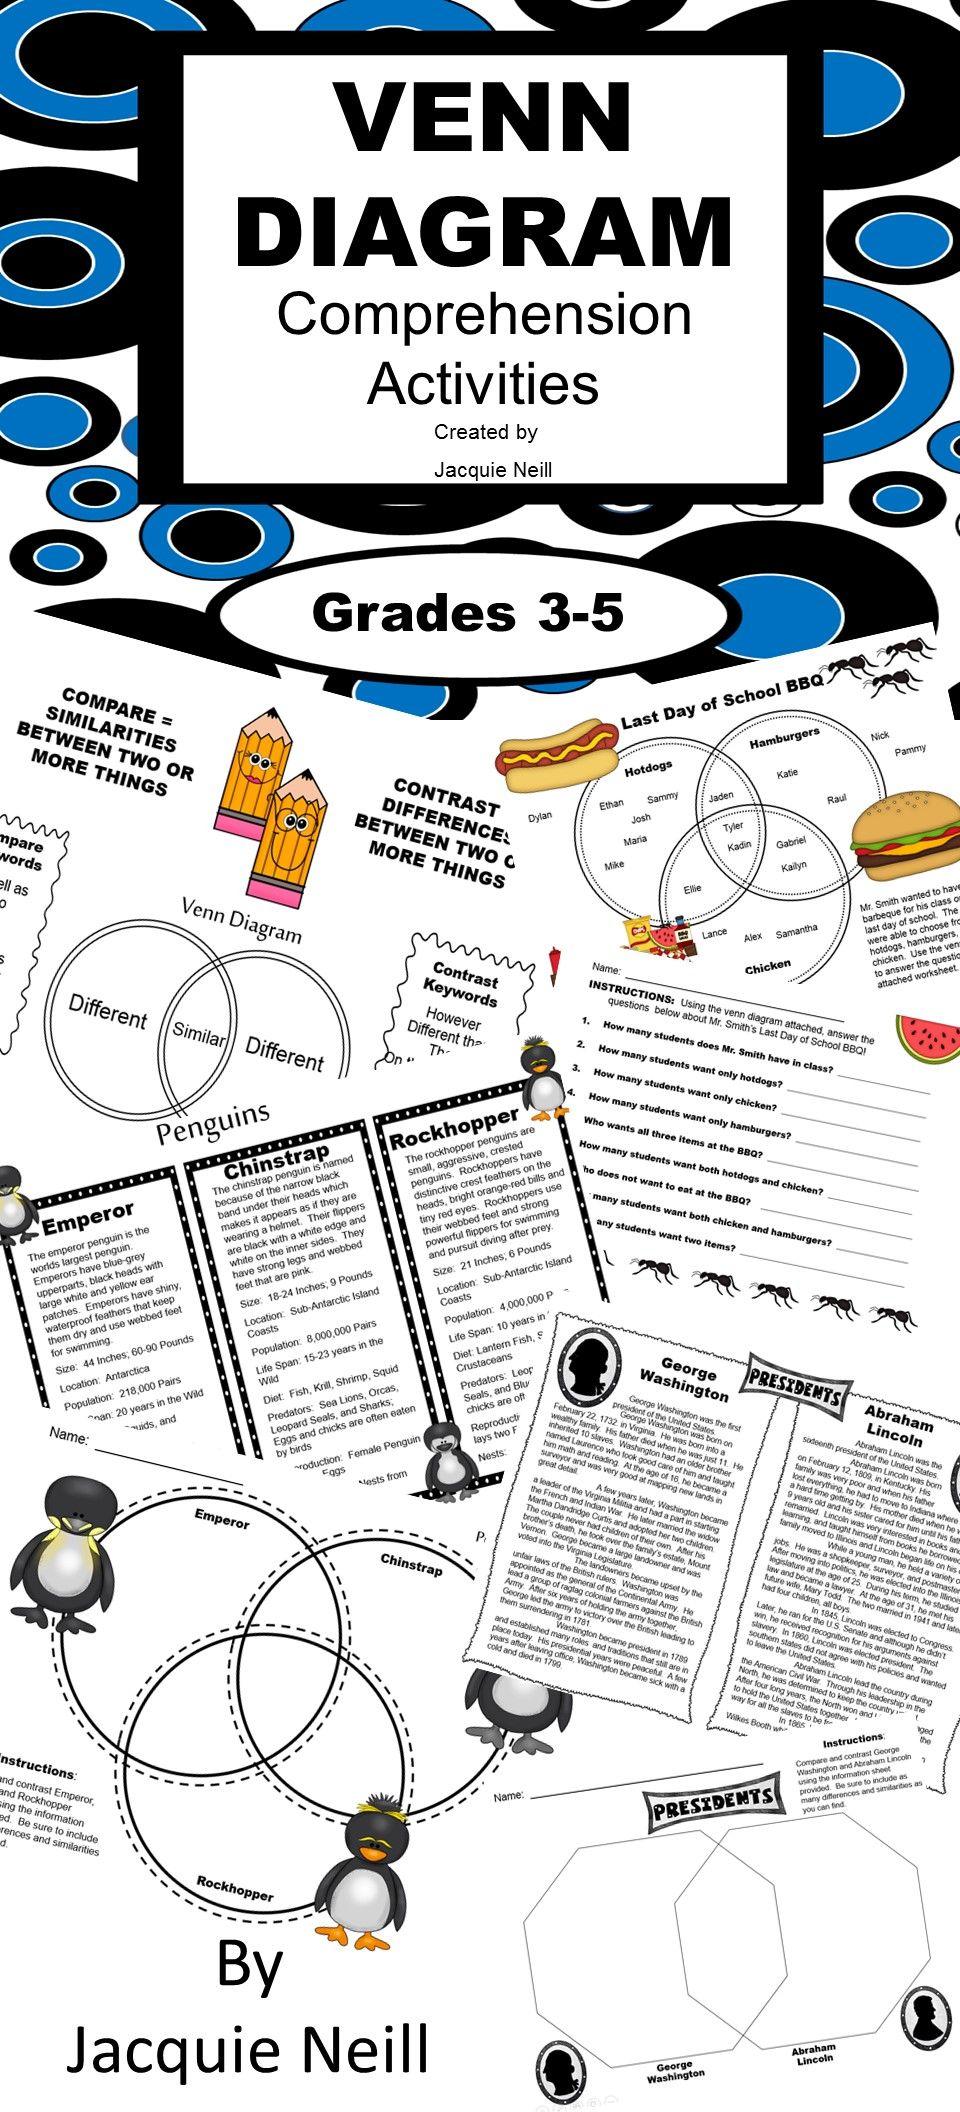 Venn Diagram Comprehension Activities | Teaching Ideas | Pinterest